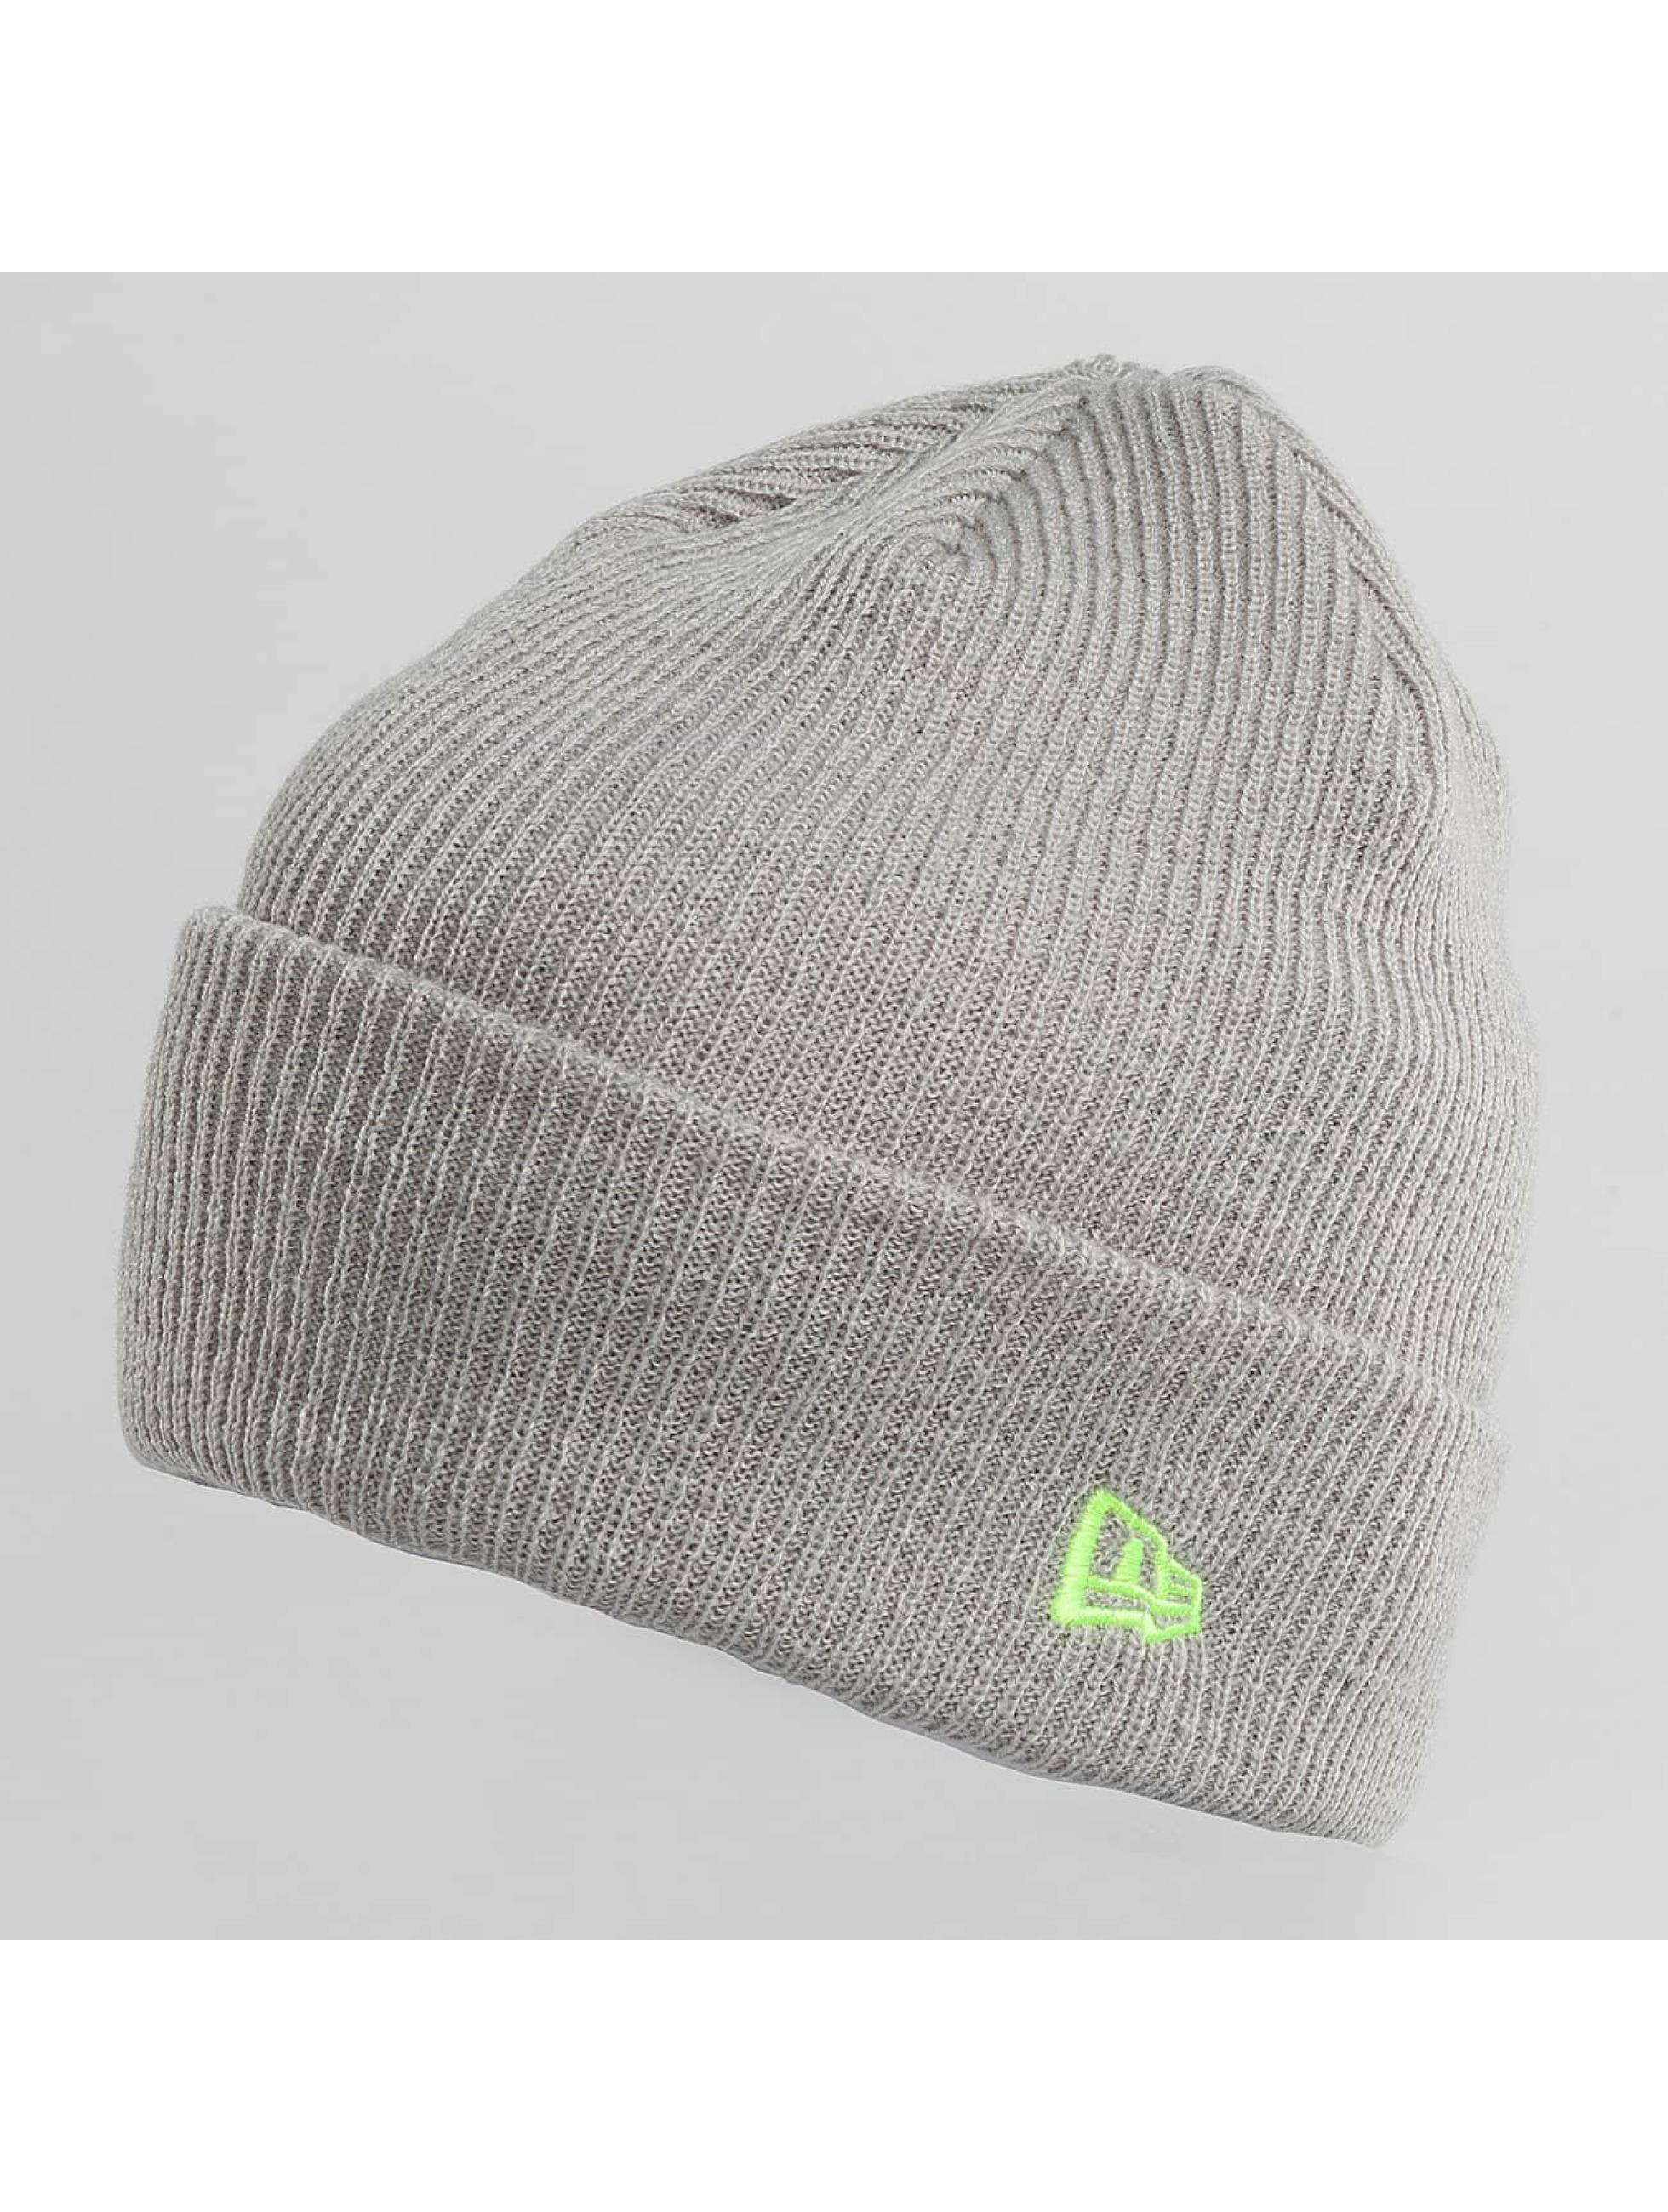 New Era Hat-1 Flag Pop Cuff gray